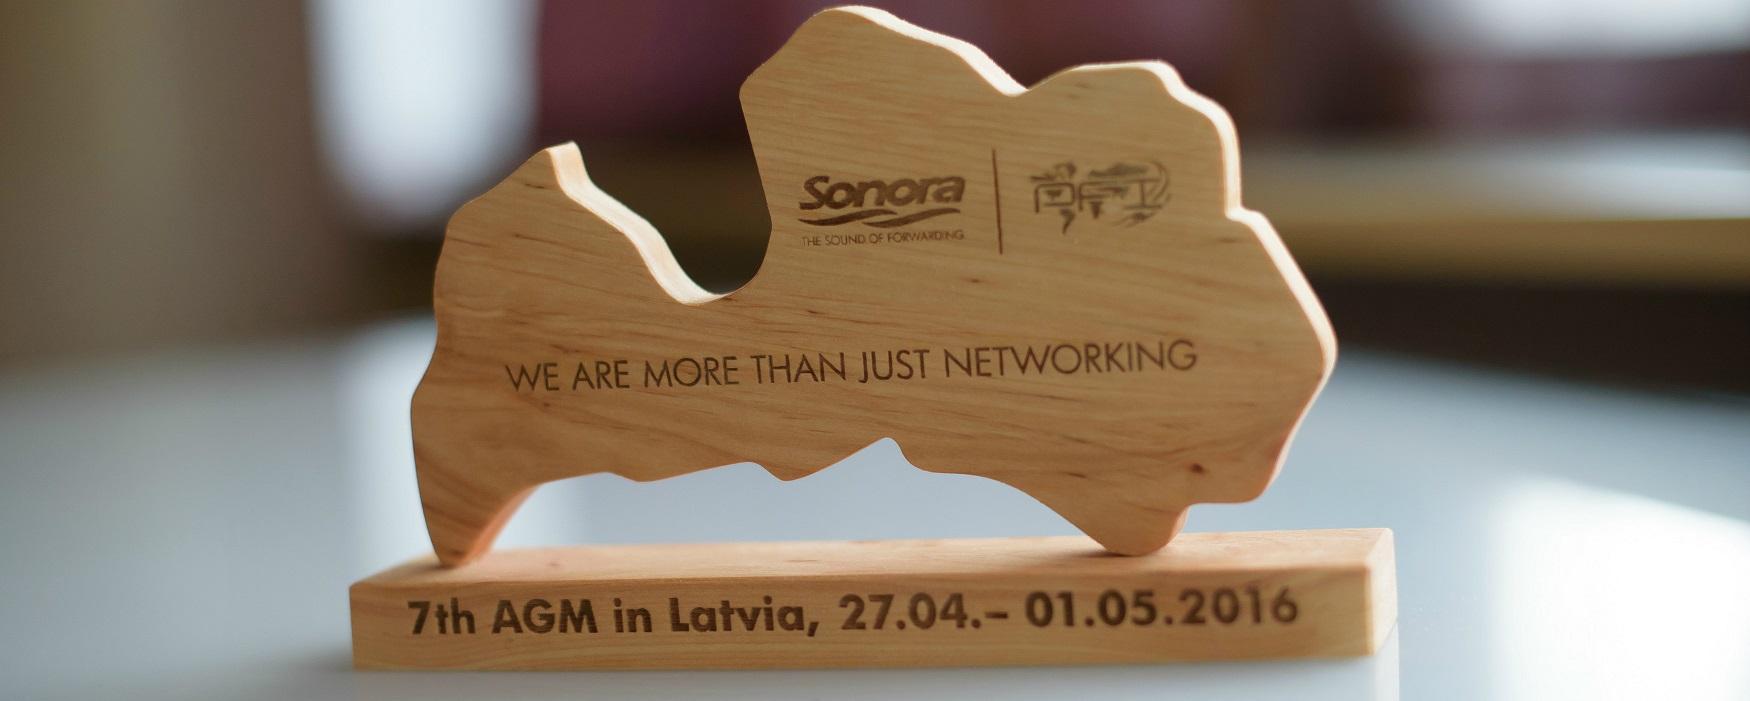 Video: Why Riga & Latvia? Why Sonora & Logistics?